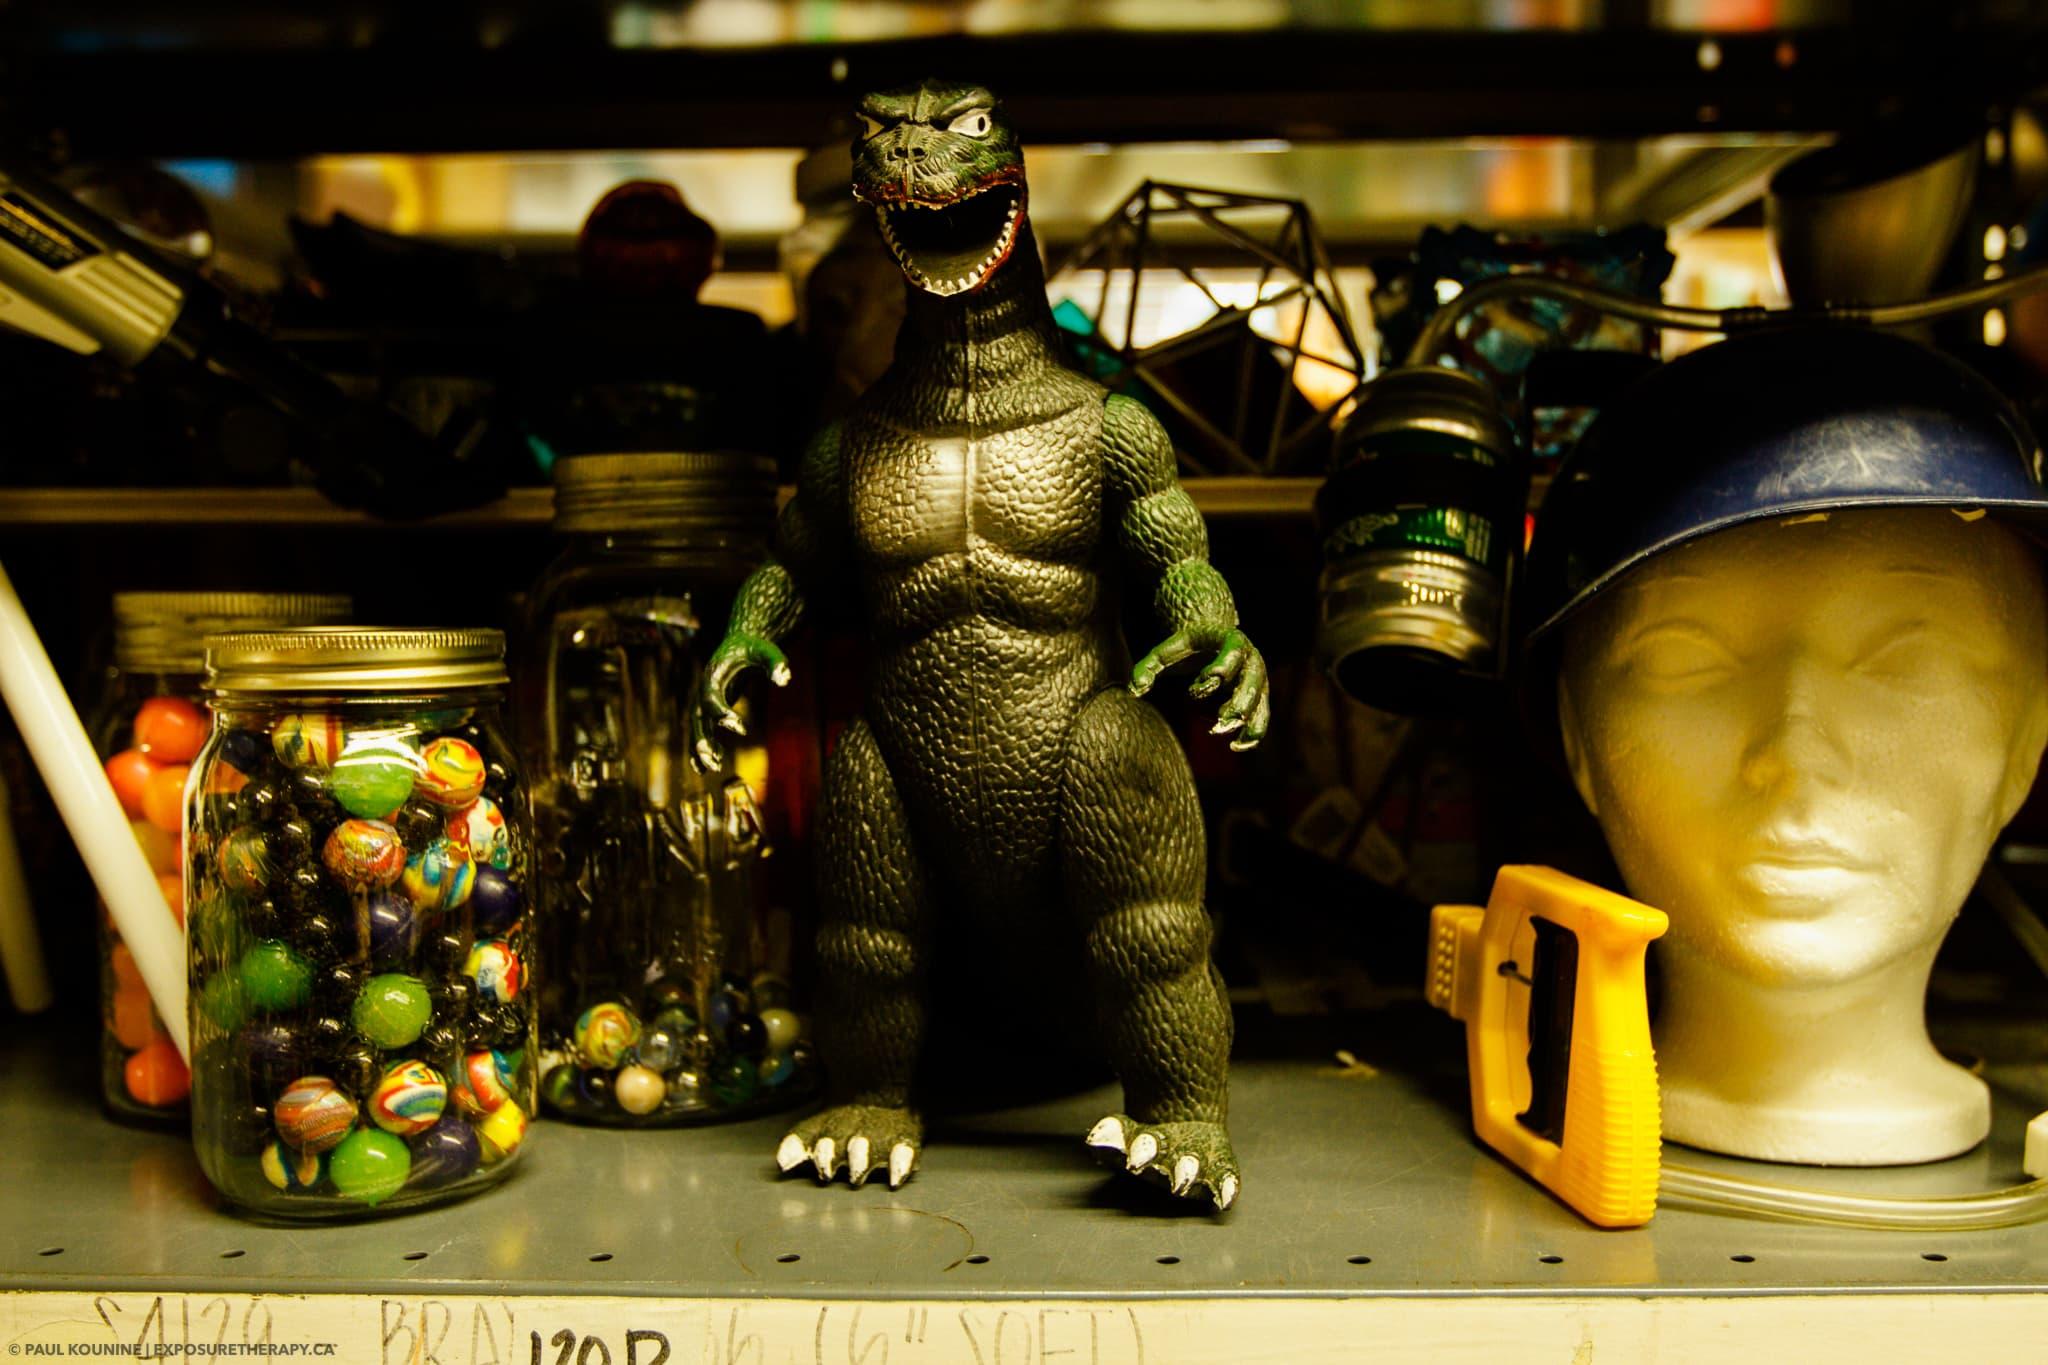 Godzilla toy in craft shop showing incorrect white balance